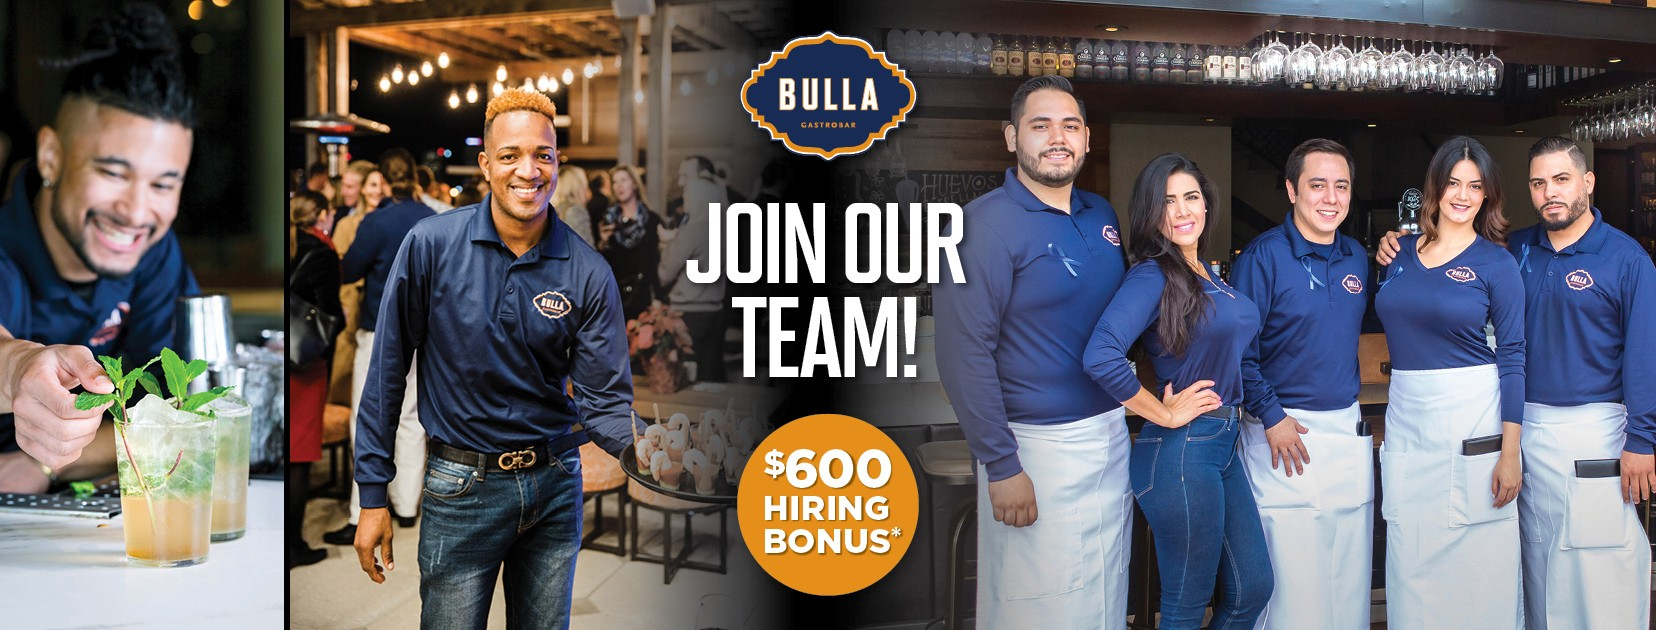 Join Our Team, $600 Hiring Bonus